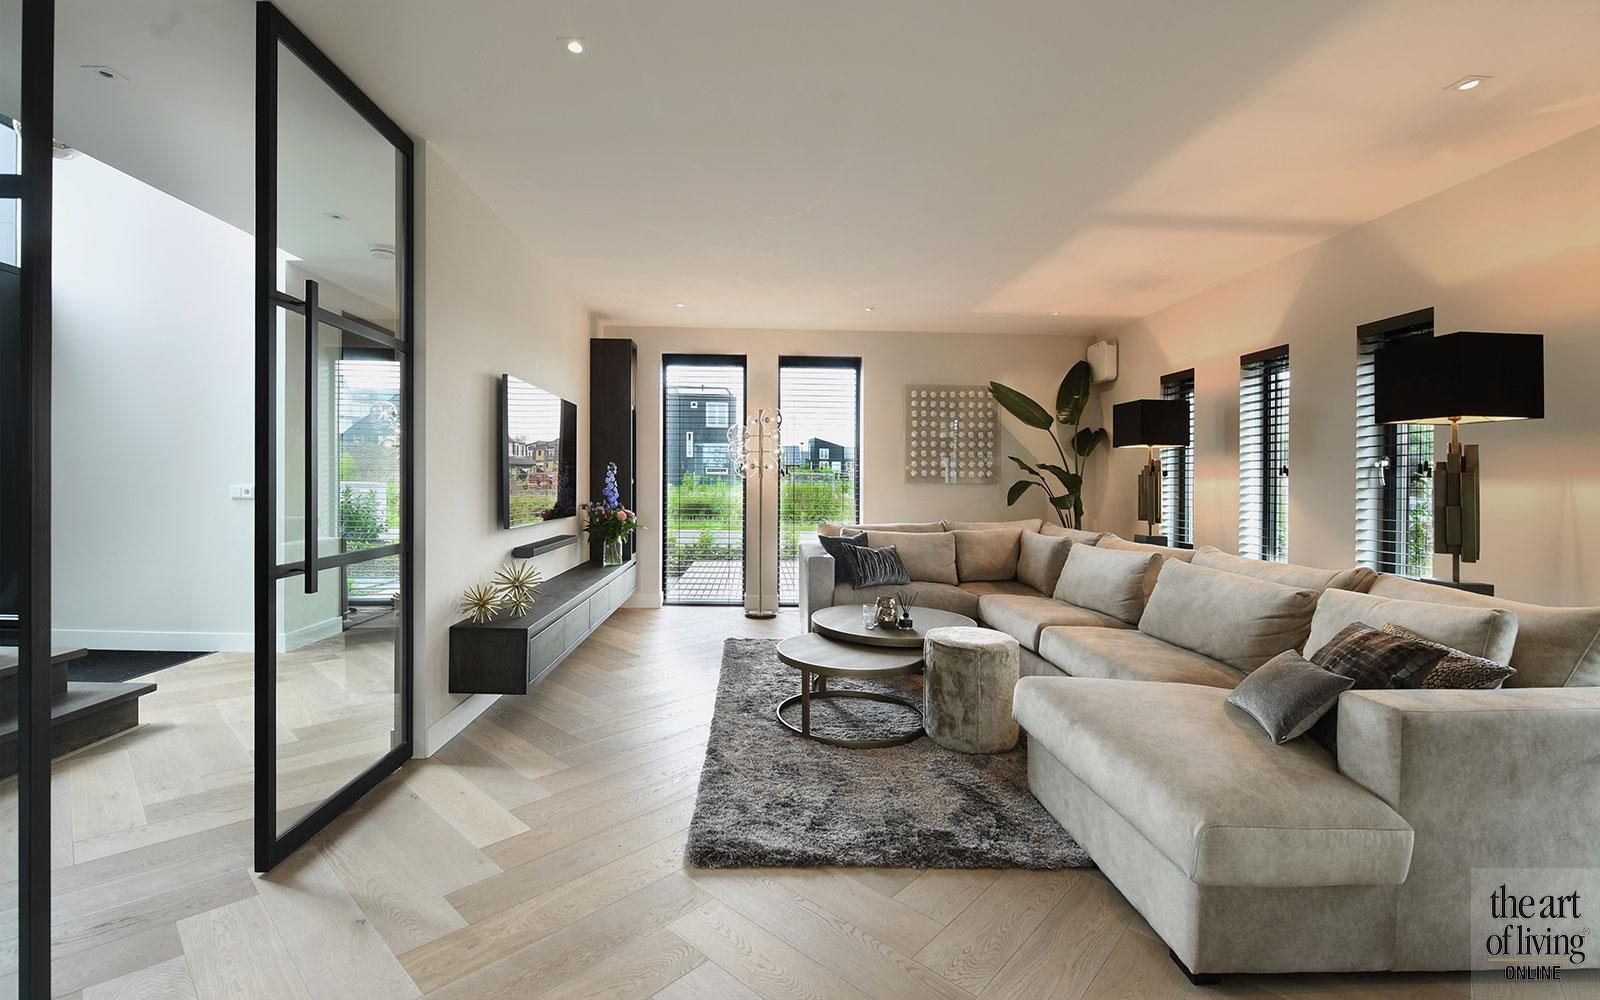 keukeneiland | WnS Architecten, the art of living